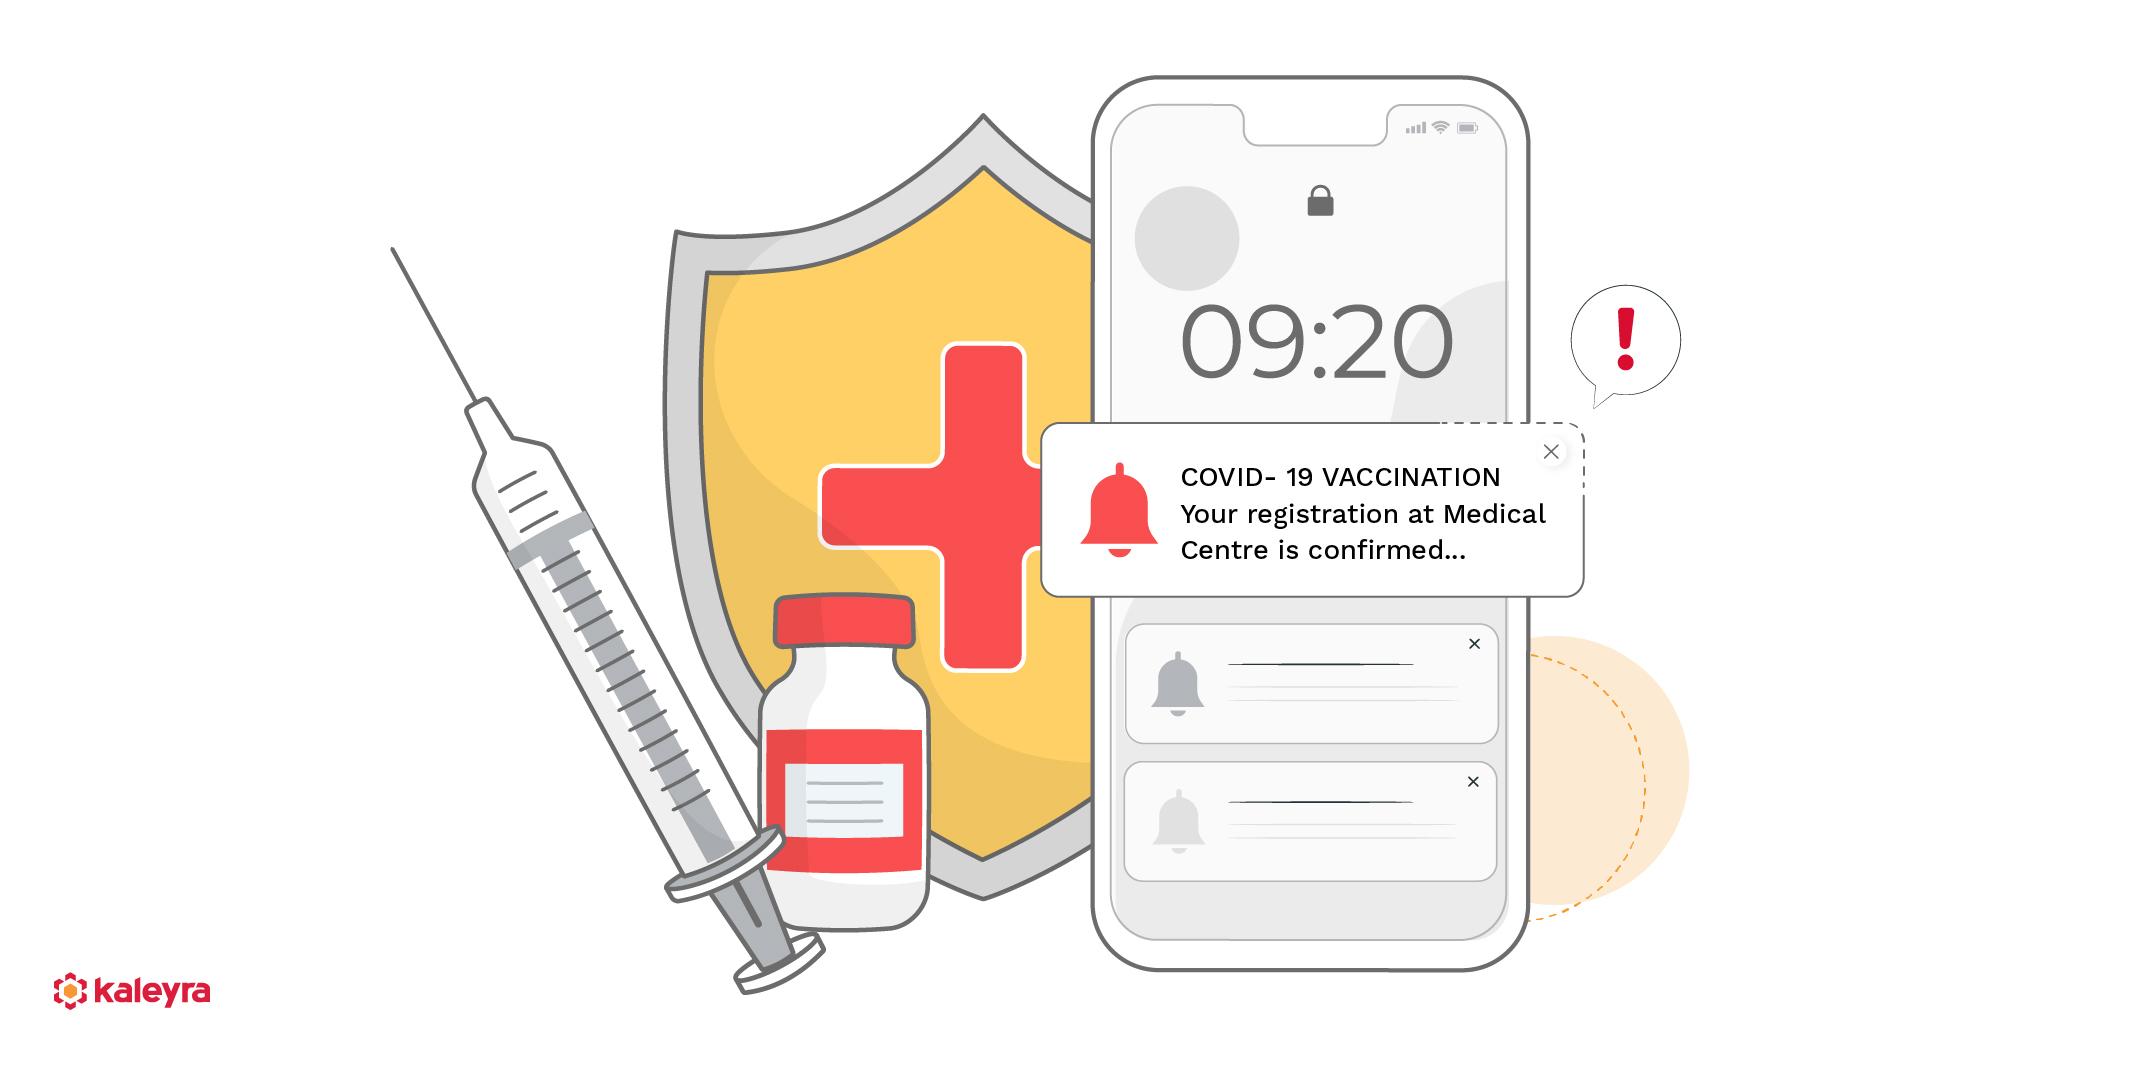 Cloud Communication for Coronavirus Vaccination